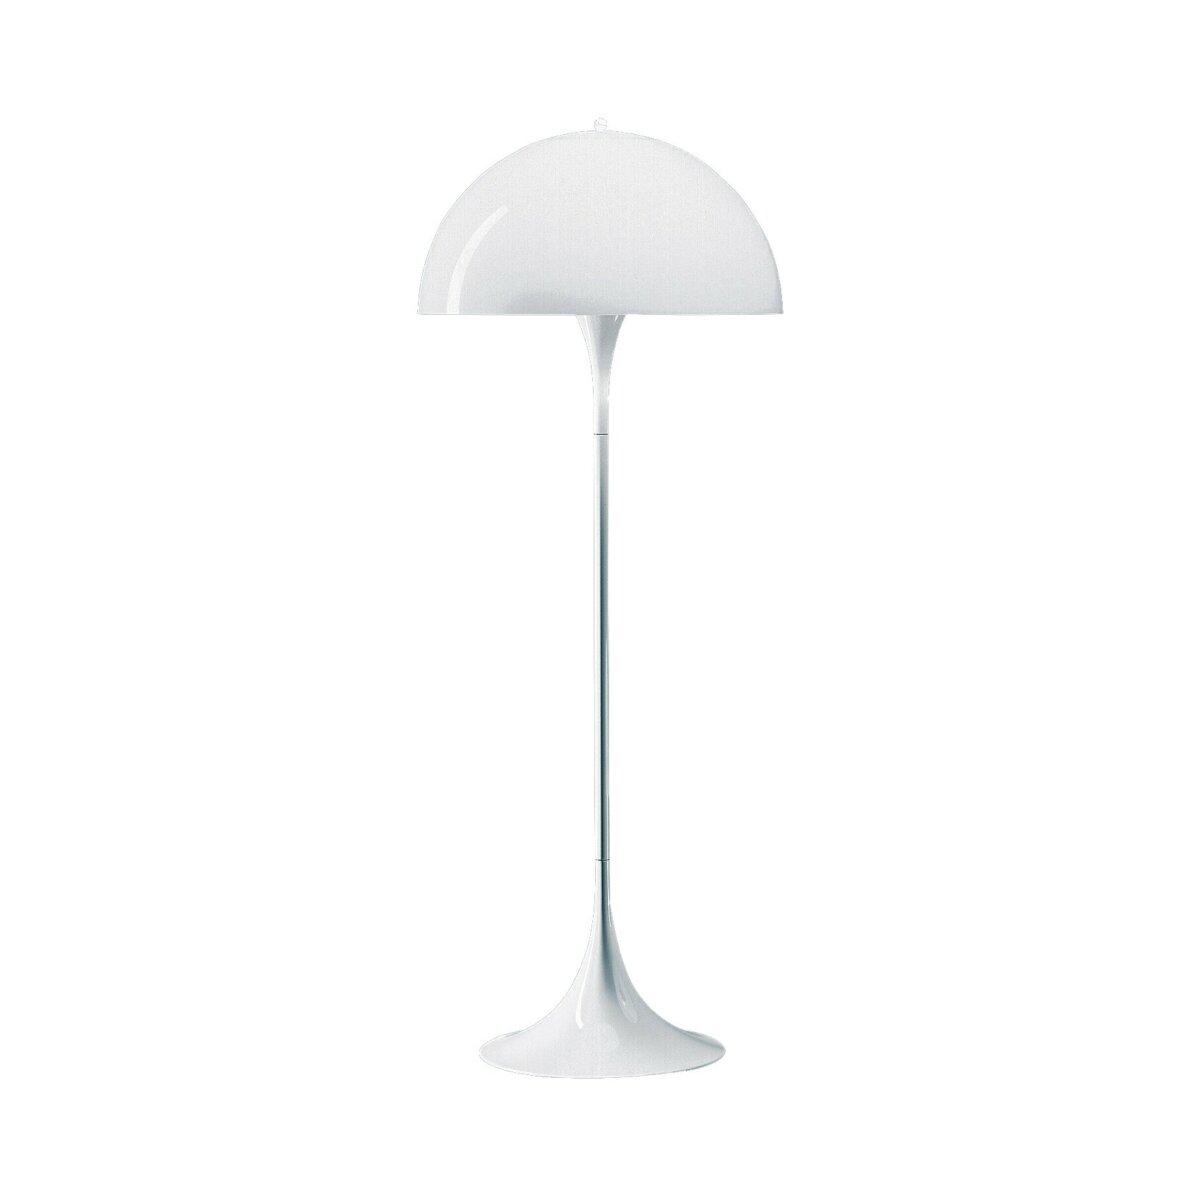 Poulsen lampa podłogowa PANTHELLA FLOOR